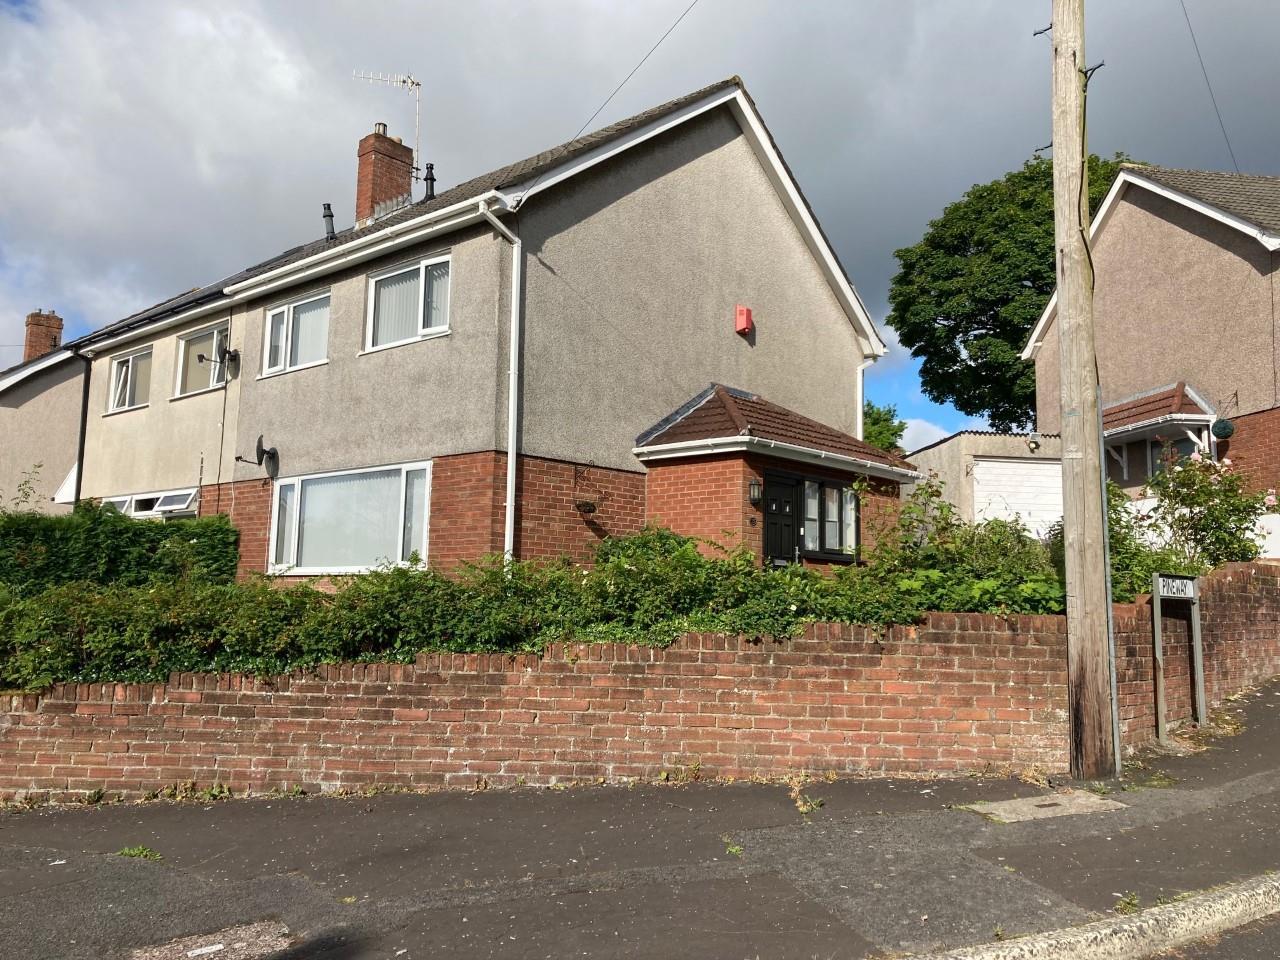 Cwmgelli Drive, Treboeth, Swansea, SA5 9BS